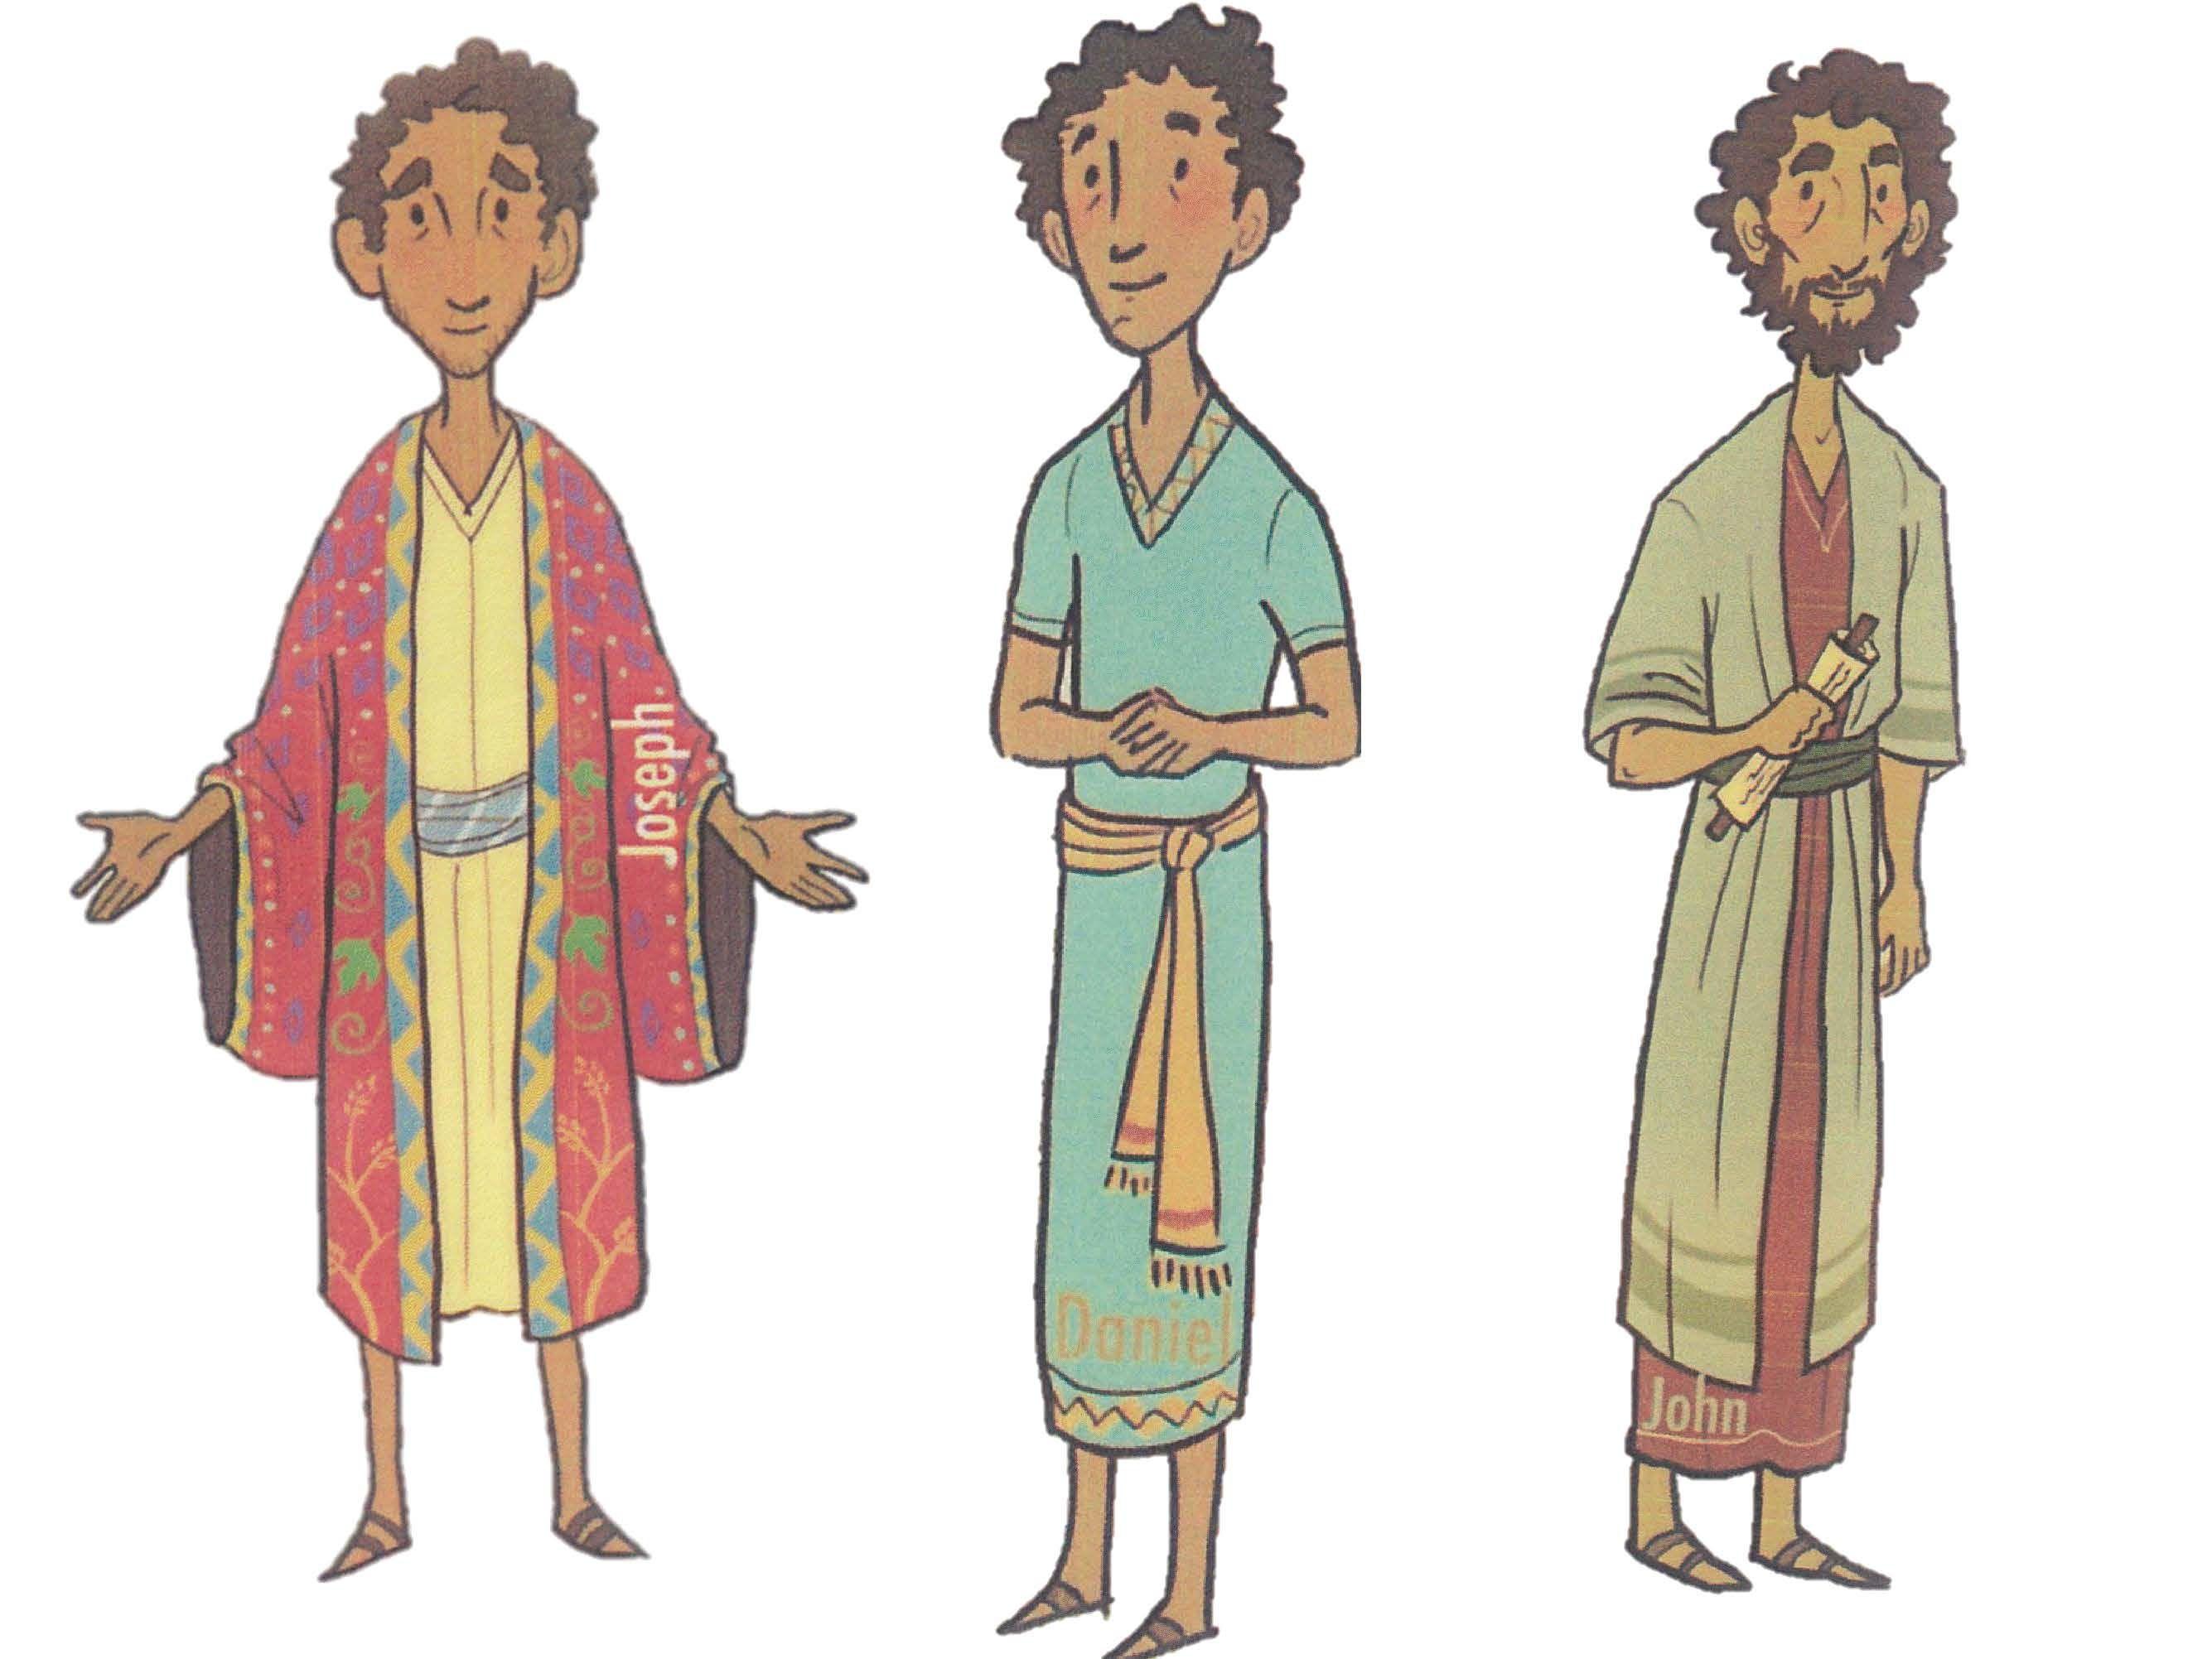 Personajes Biblia 5   Personajes de la Biblia   Biblia ...